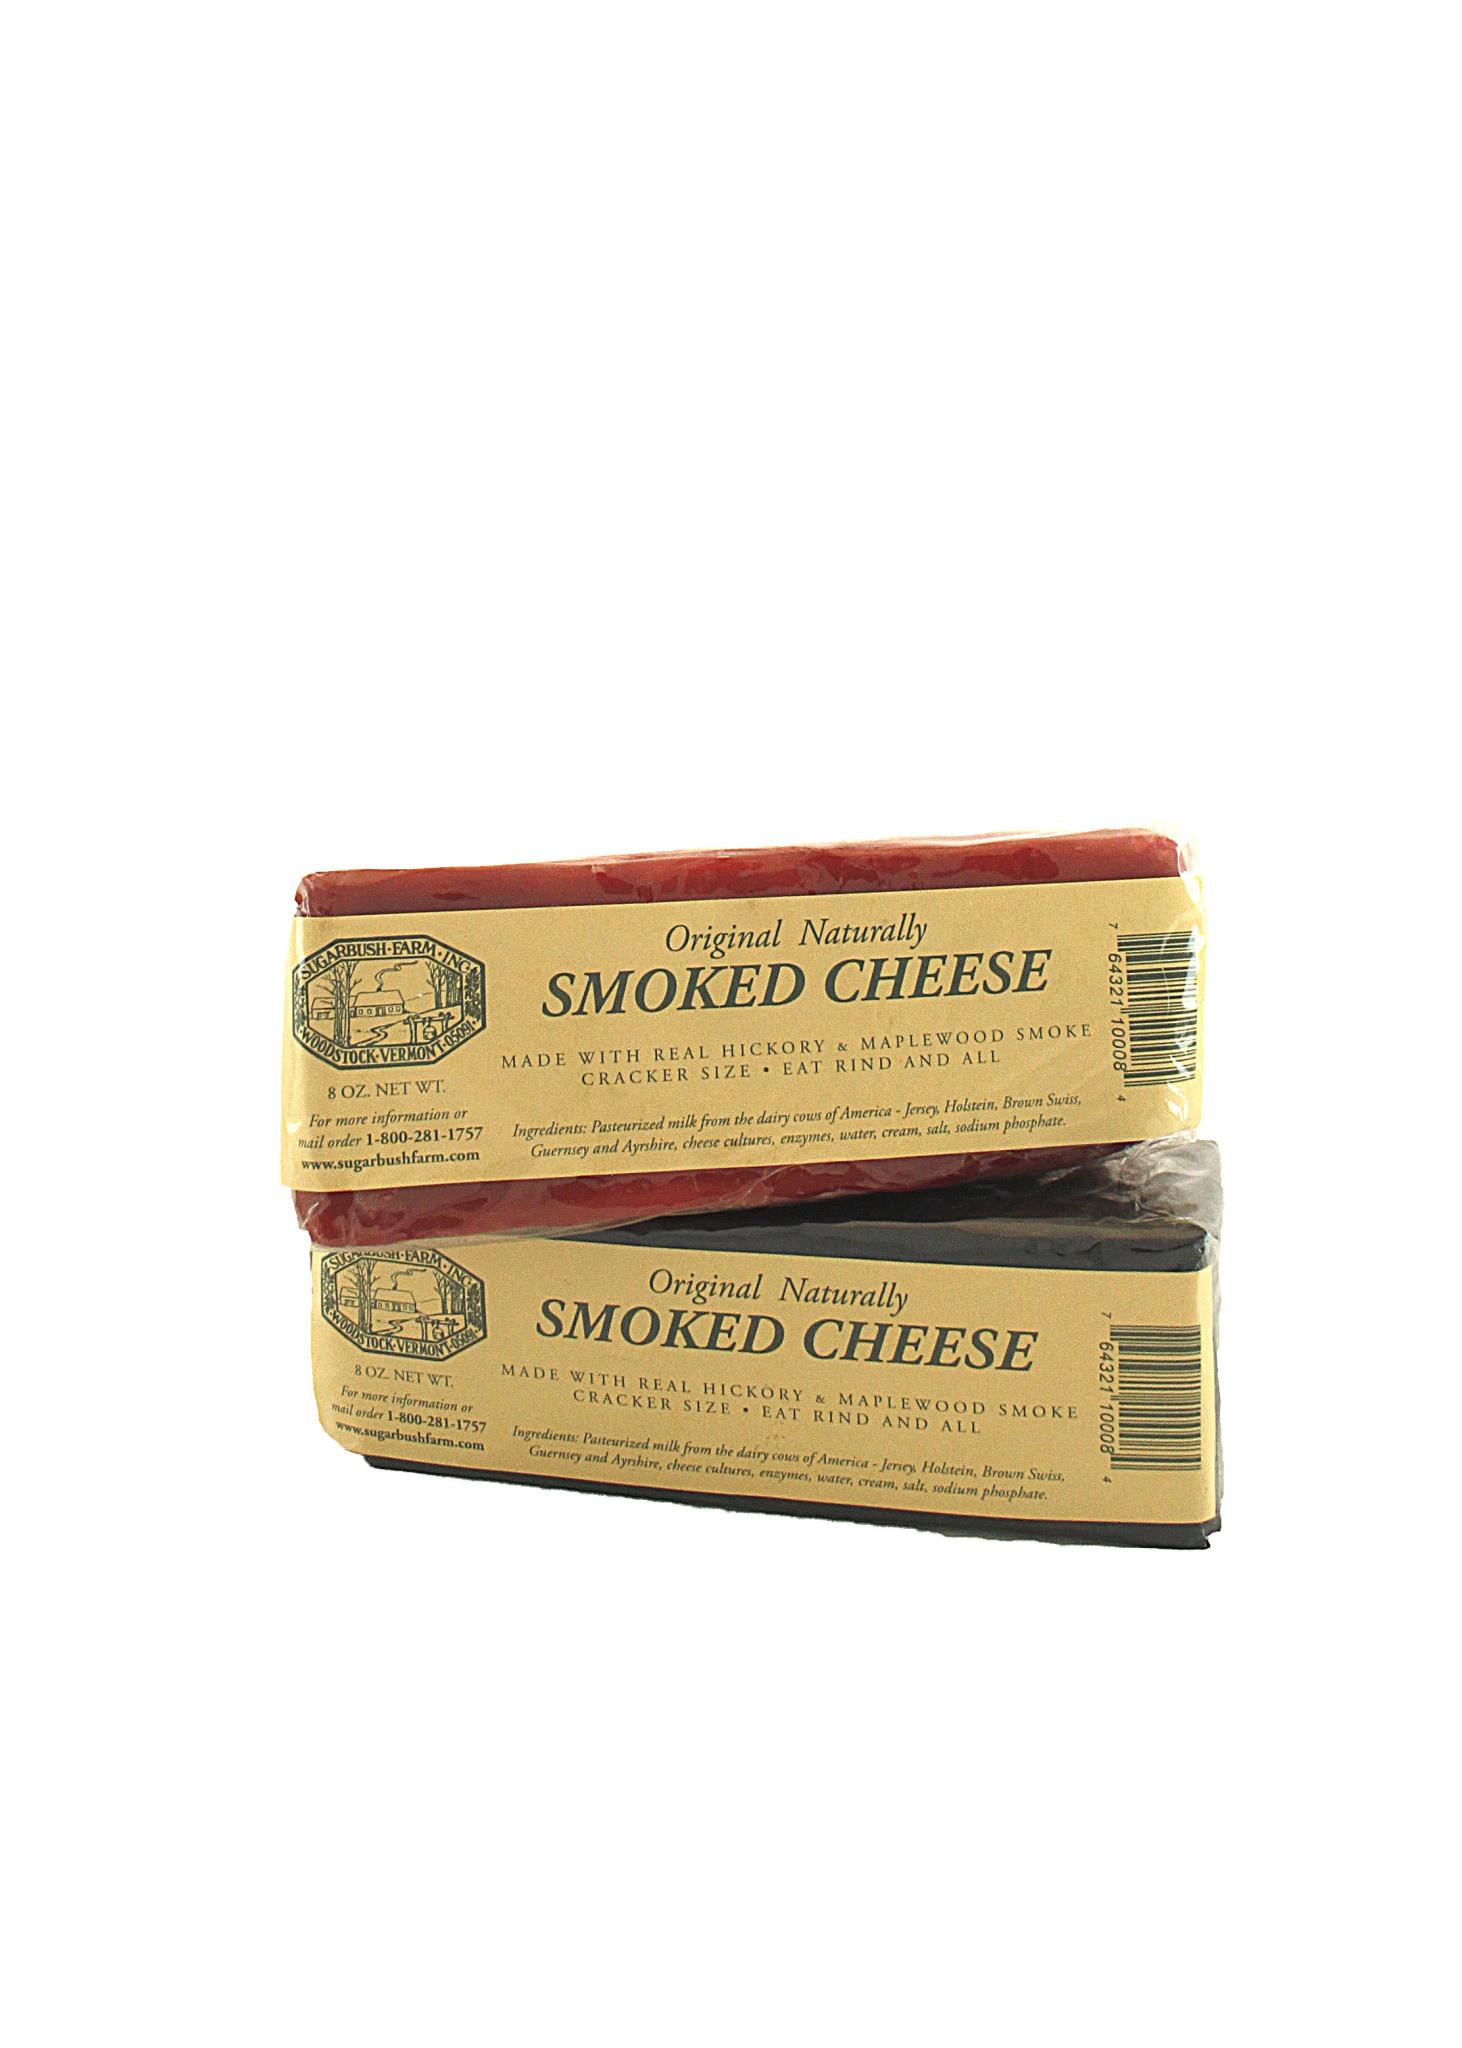 Sugarbush Farm Smoked Cheese, 8 ounce